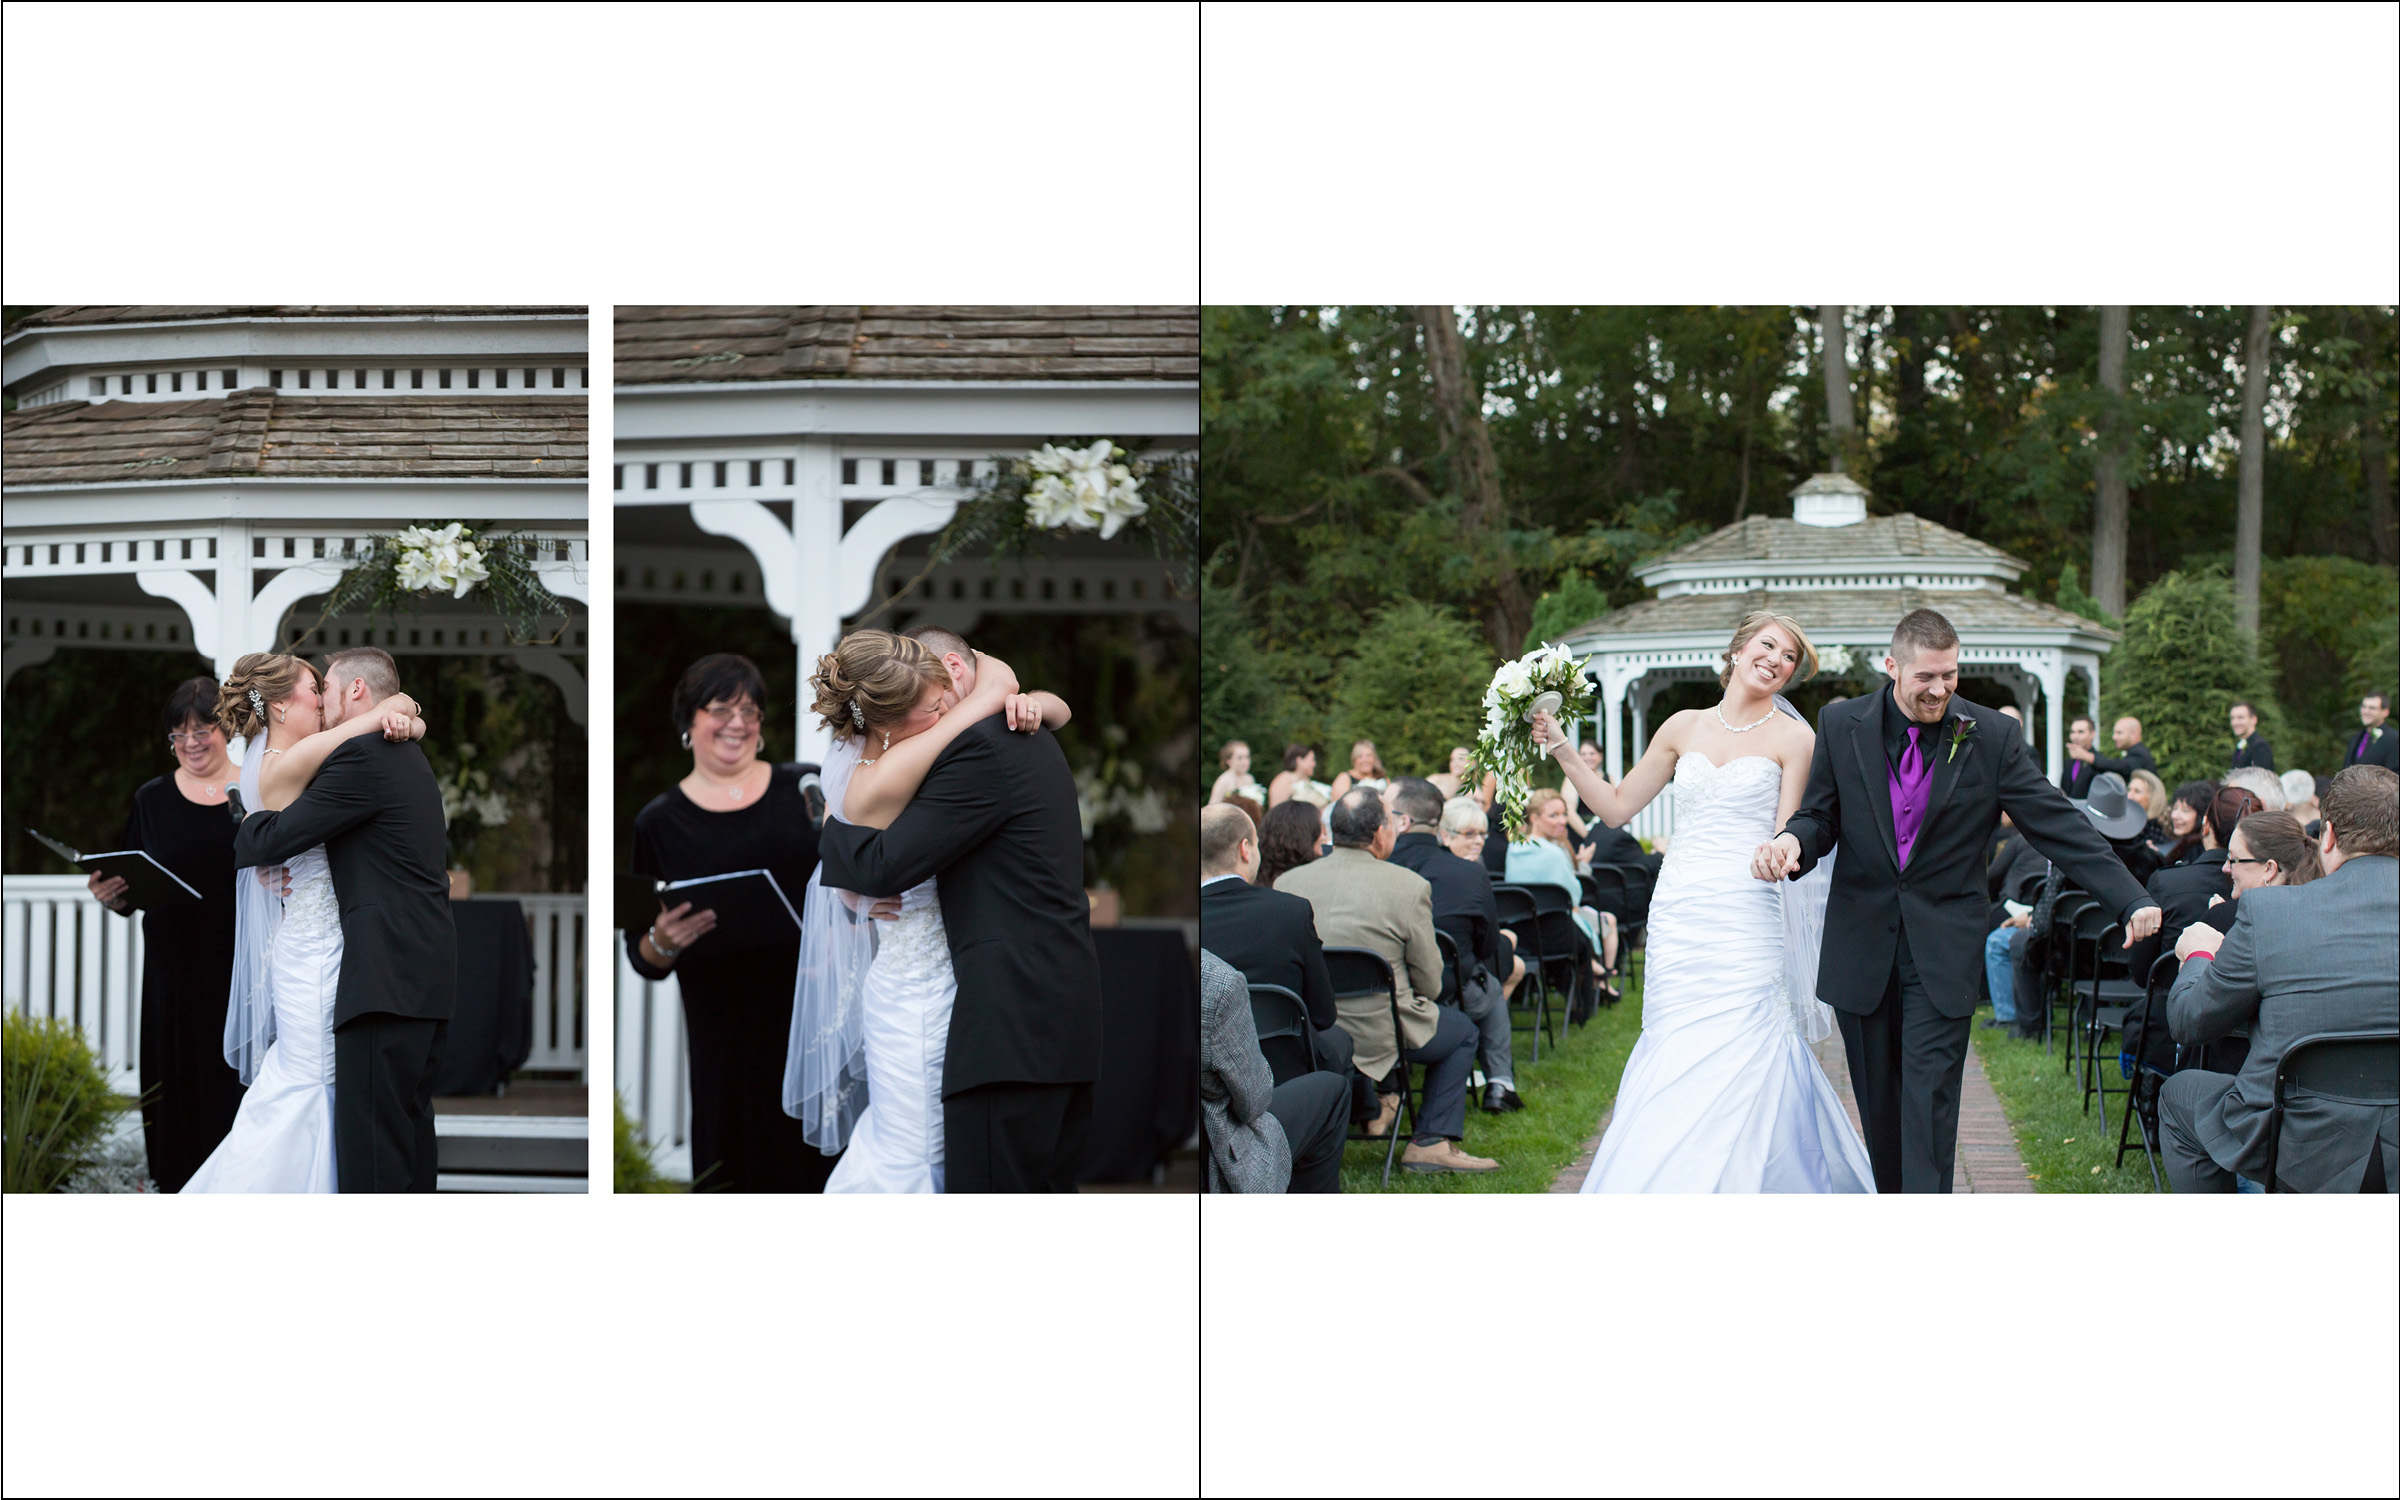 8x10 Wedding Album7.jpg